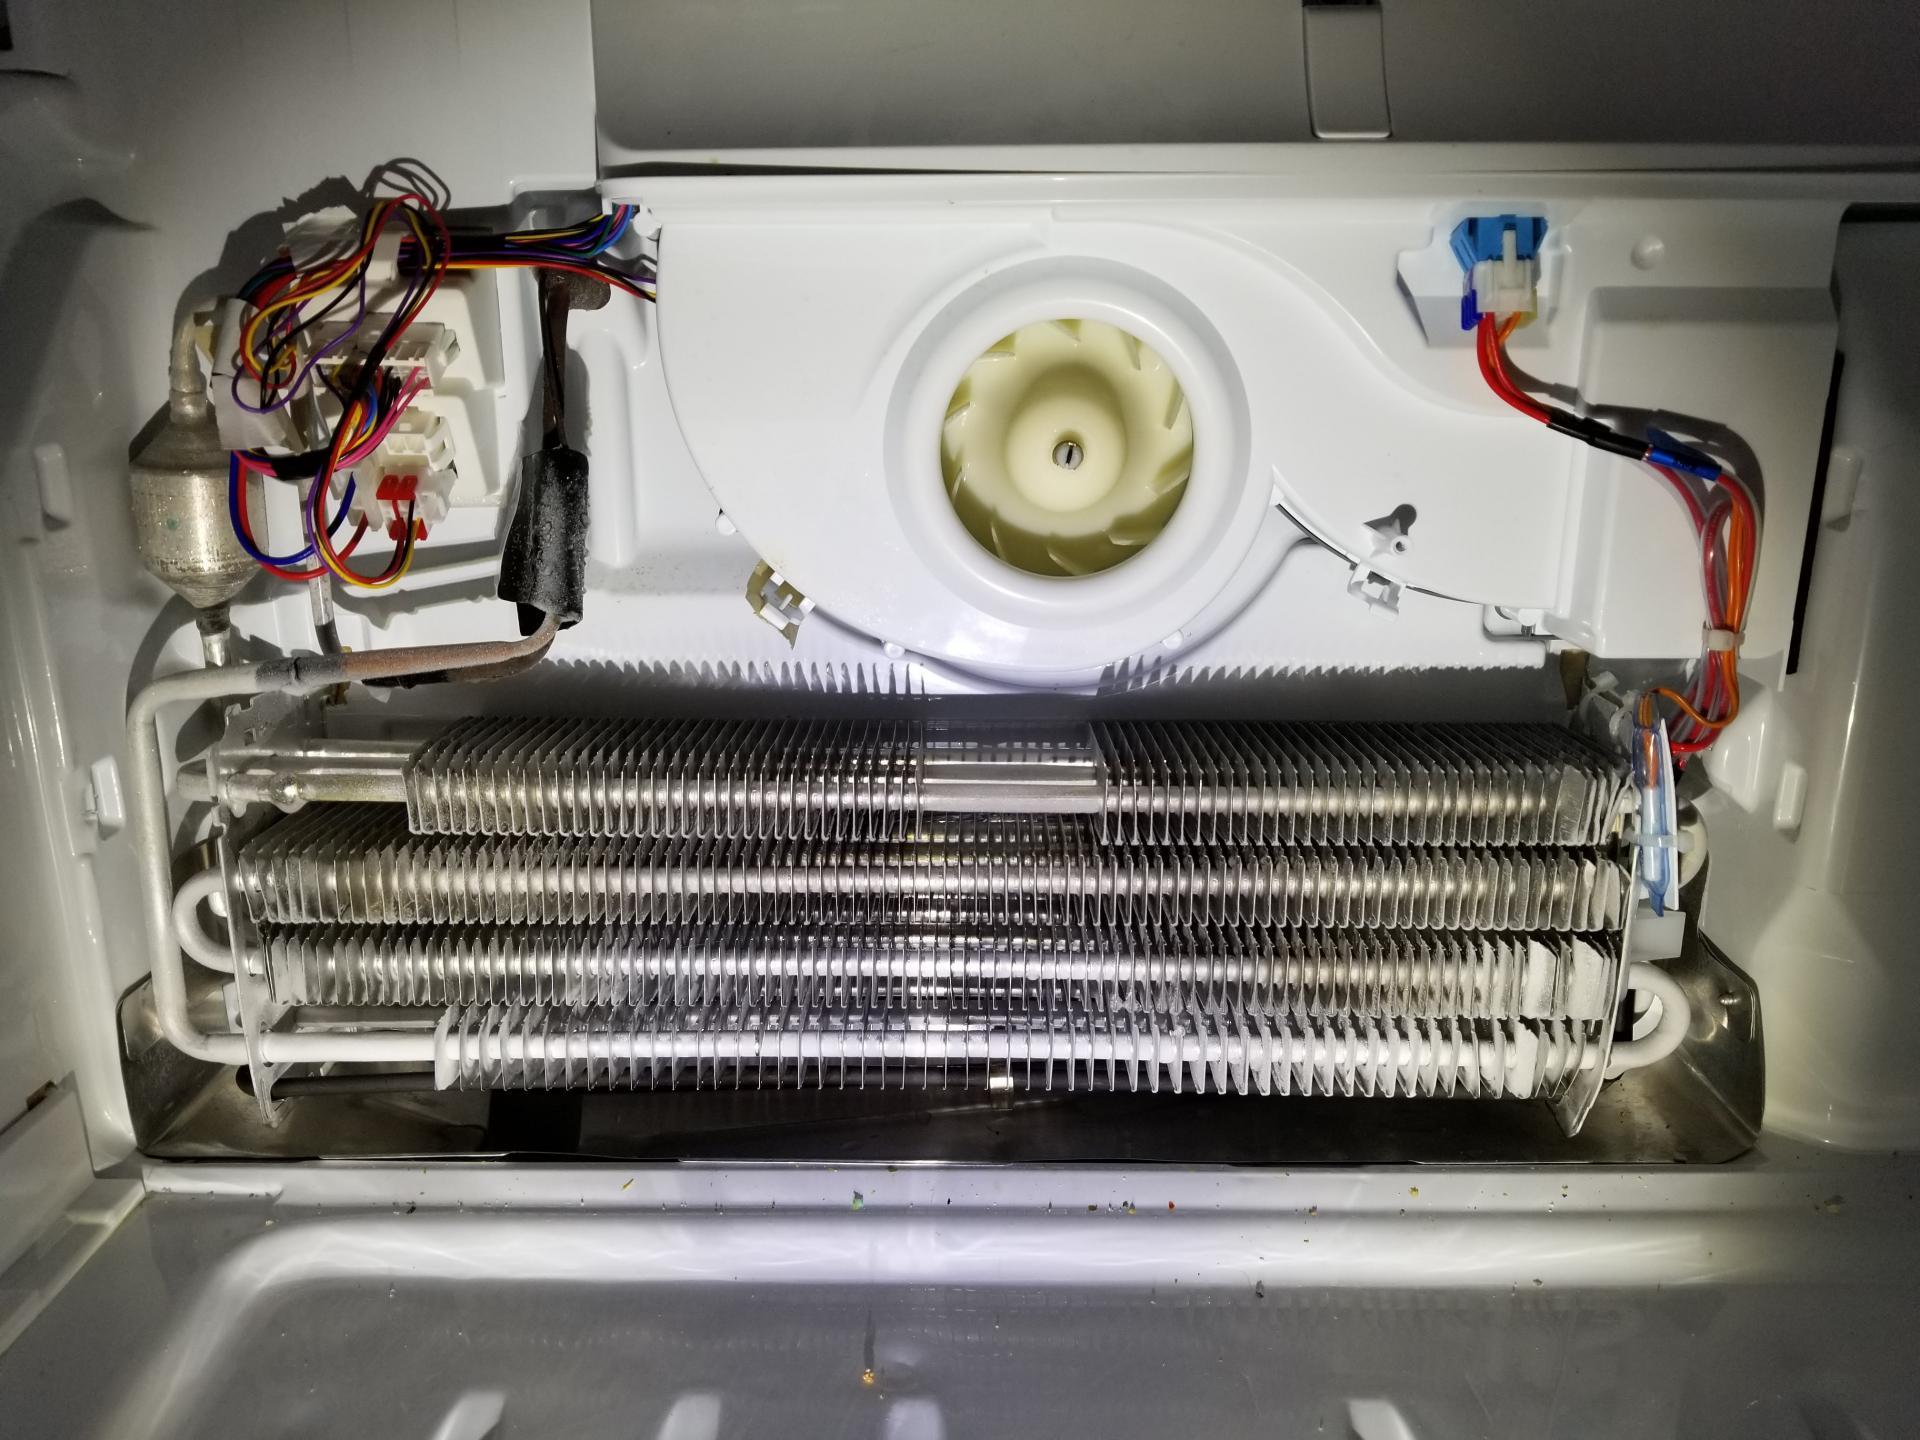 Lmxs30776s 02 Refrigerator Not Cooling New Evap Fan Motor Part